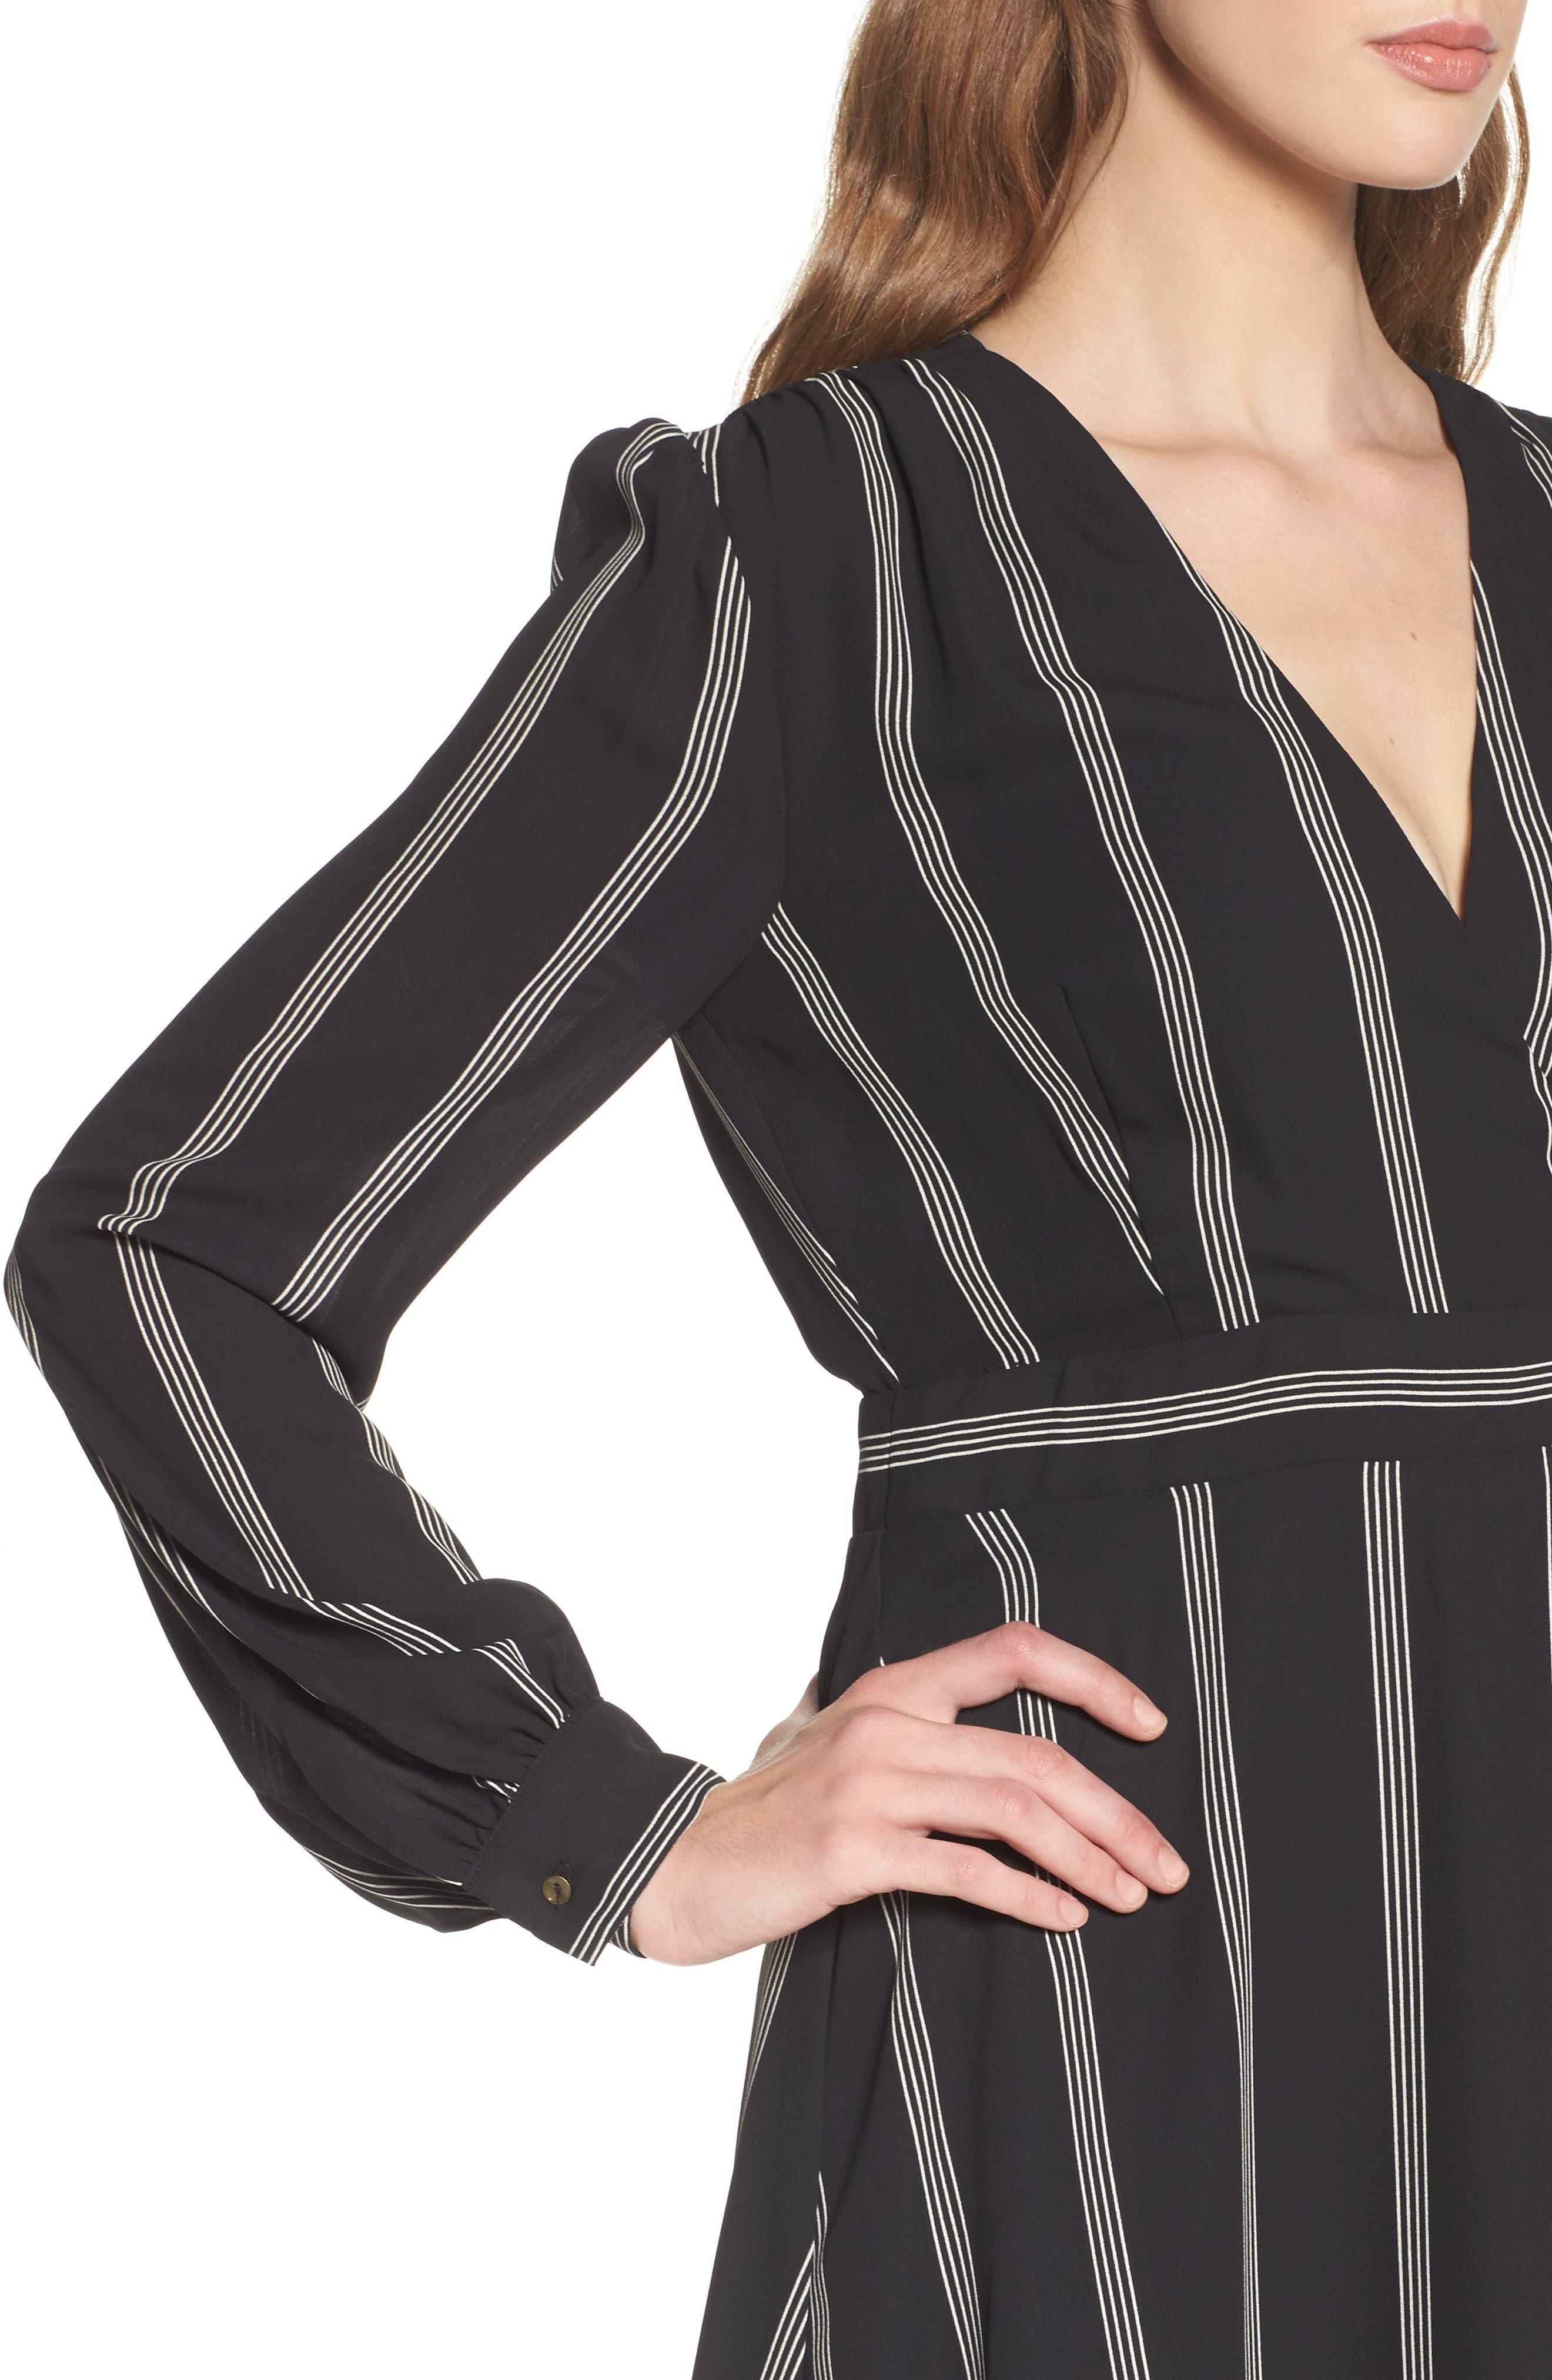 Stripe Fit & Flare Dress,                             Alternate thumbnail 4, color,                             002